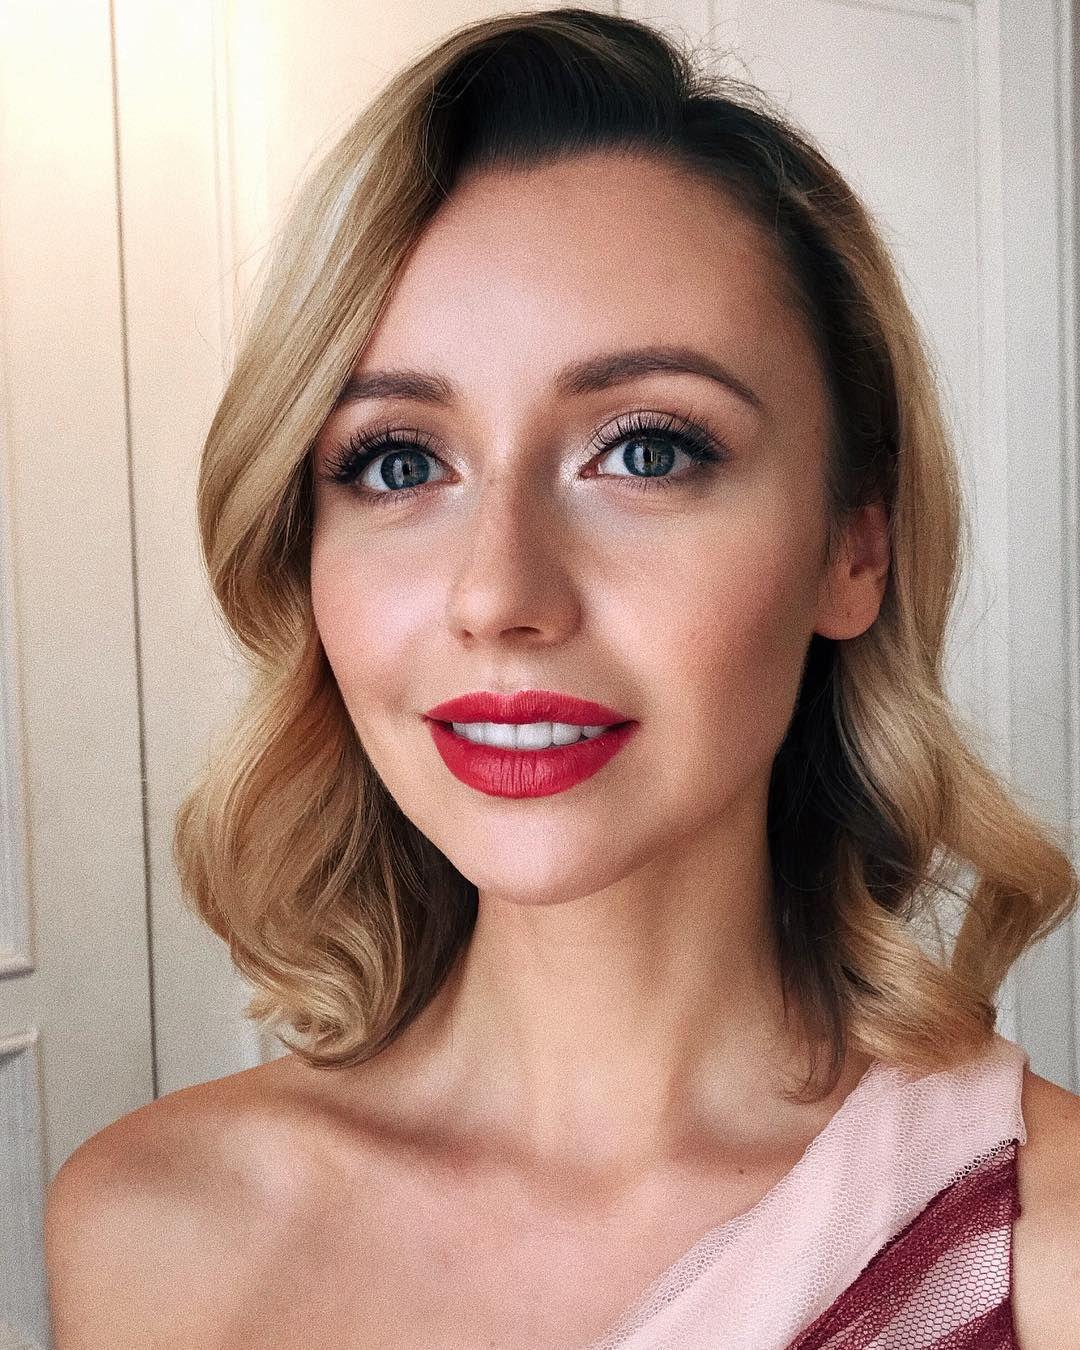 My super star @natalyosmann ❤ Makeup&hairstyle @sandraistomina